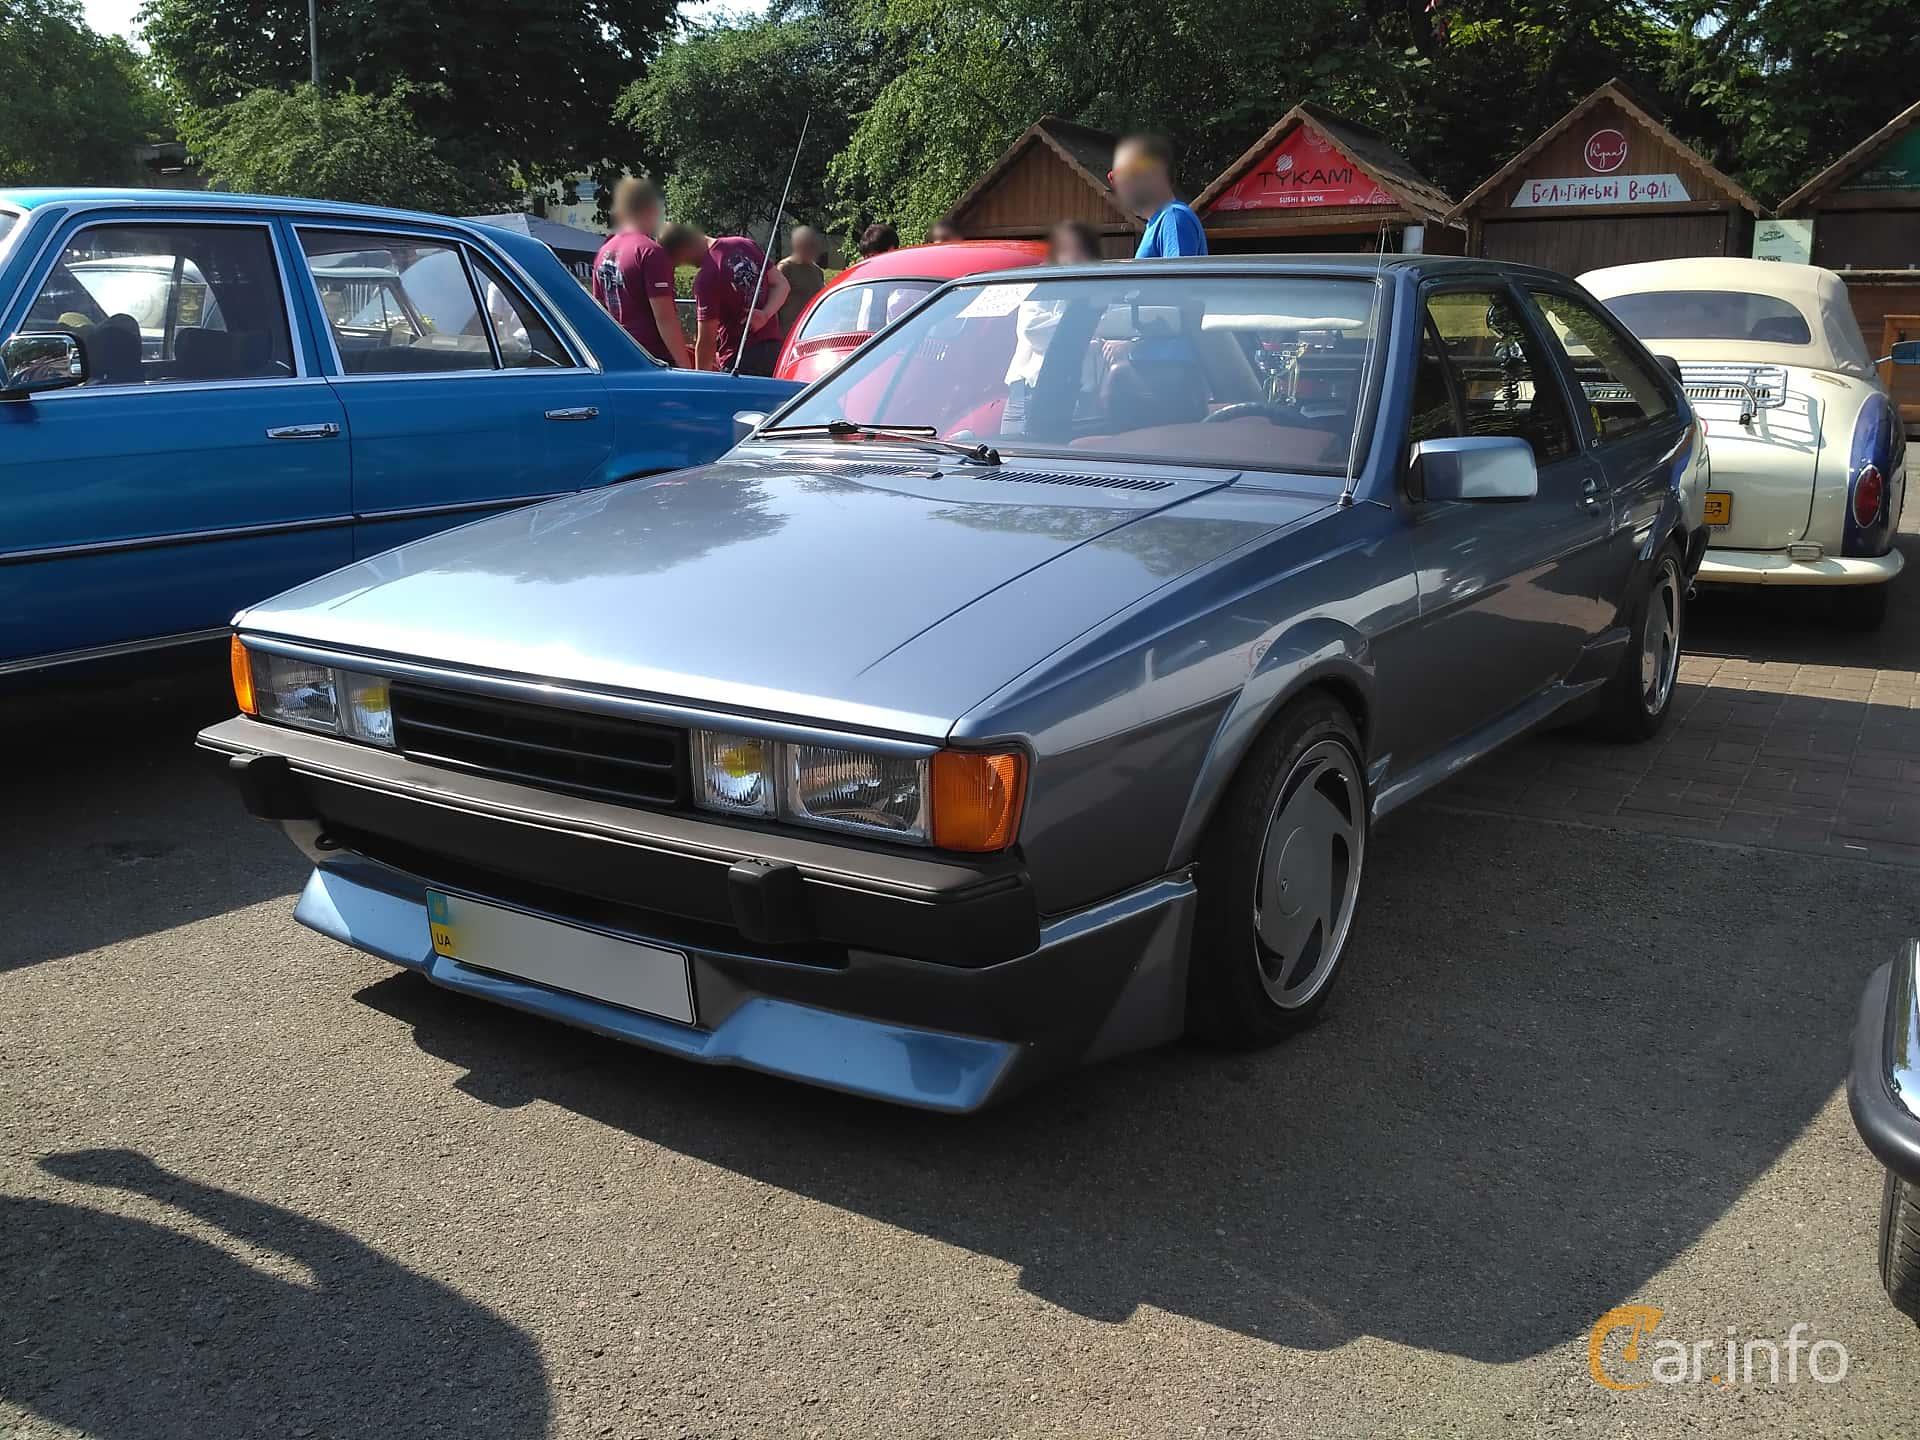 Volkswagen Scirocco 1982 at Leopolis Grand Prix 2018